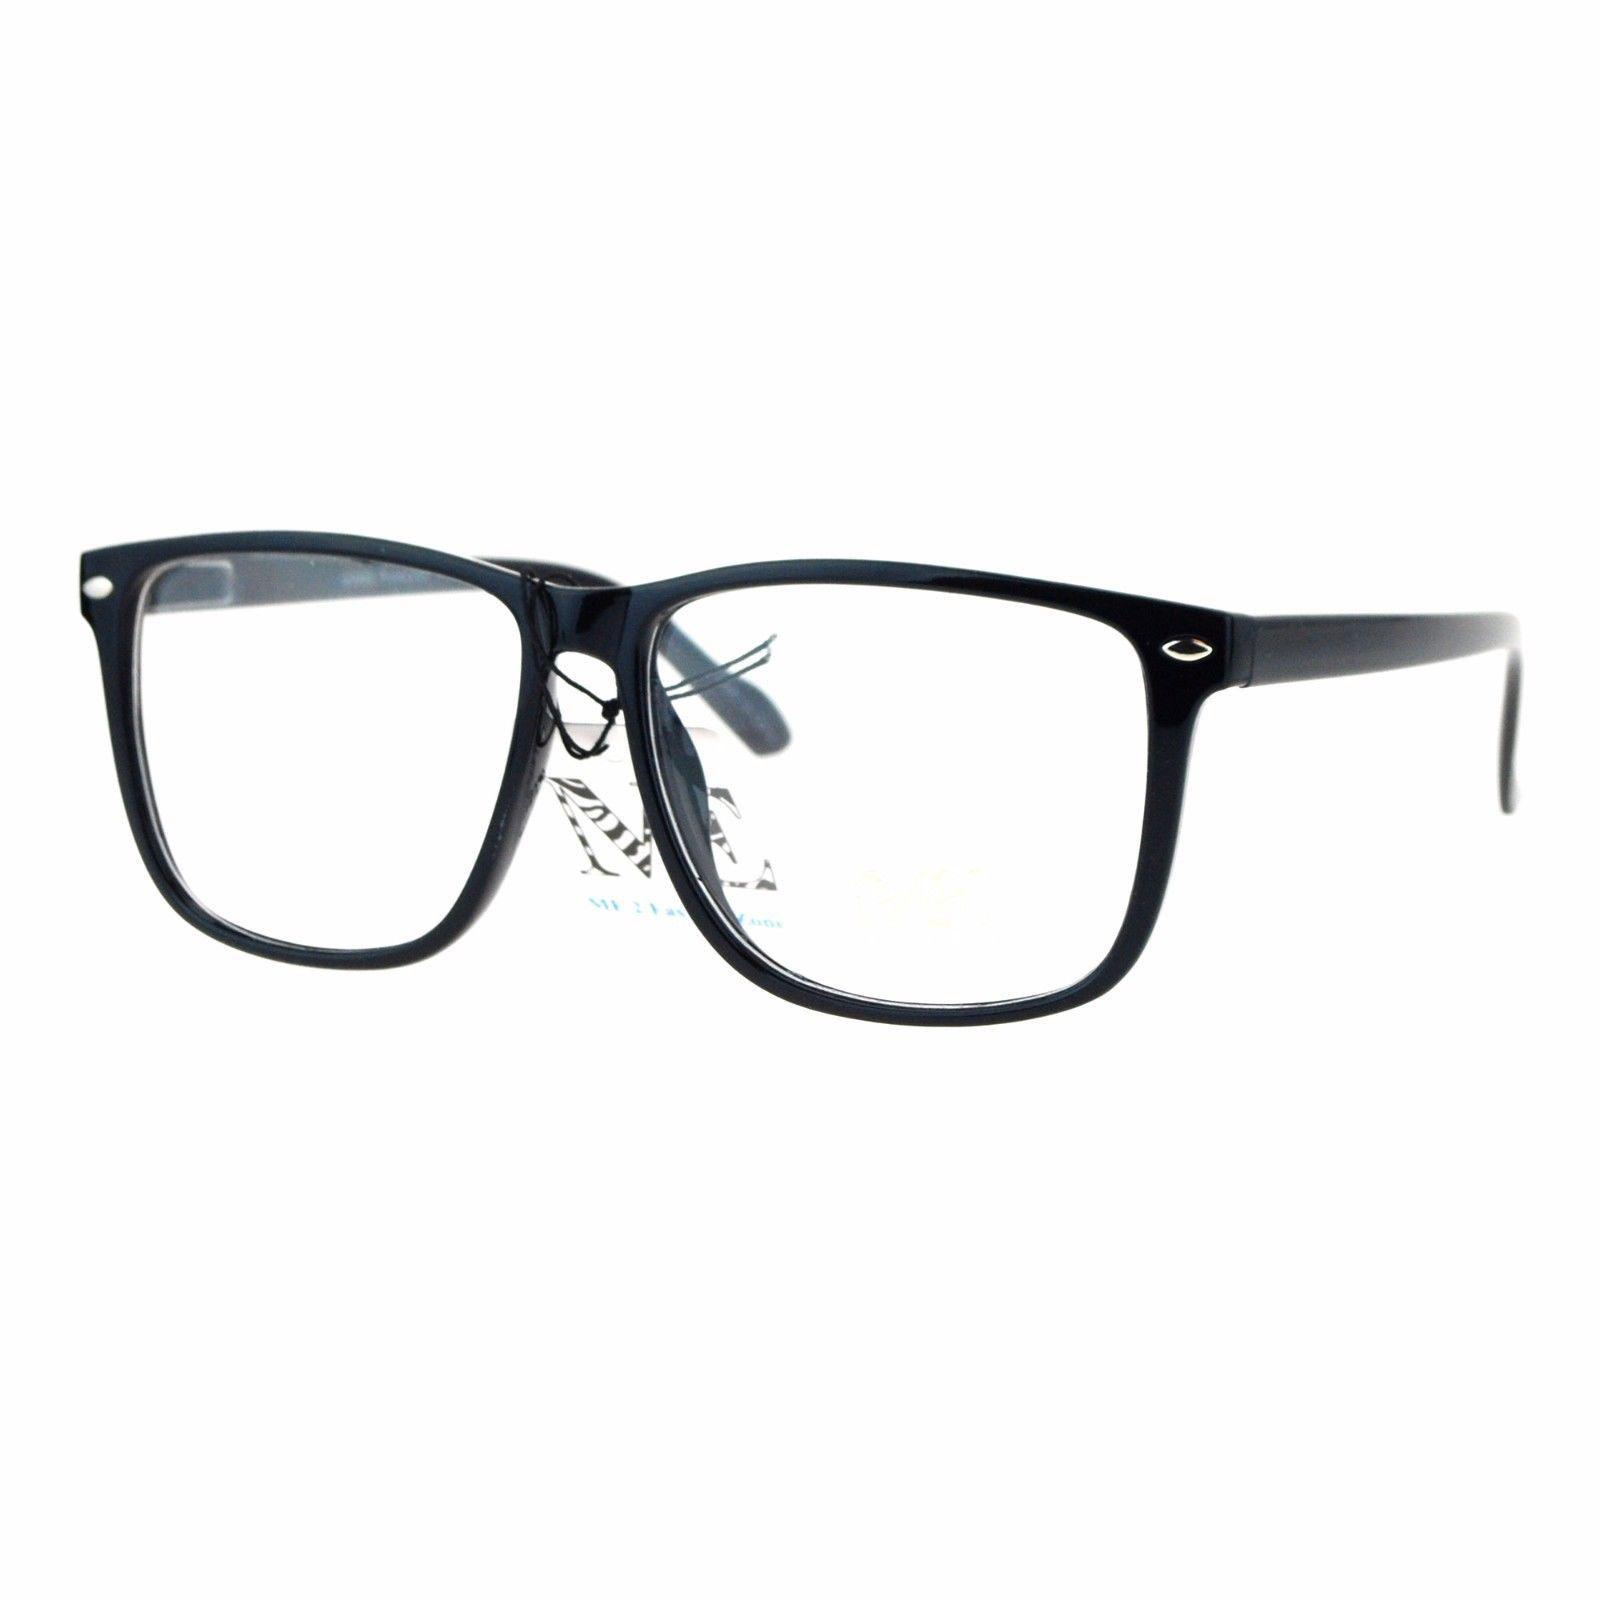 Clear Lens Glasses Unisex Fashion Eyeglasses Square Spring Hinge Frame